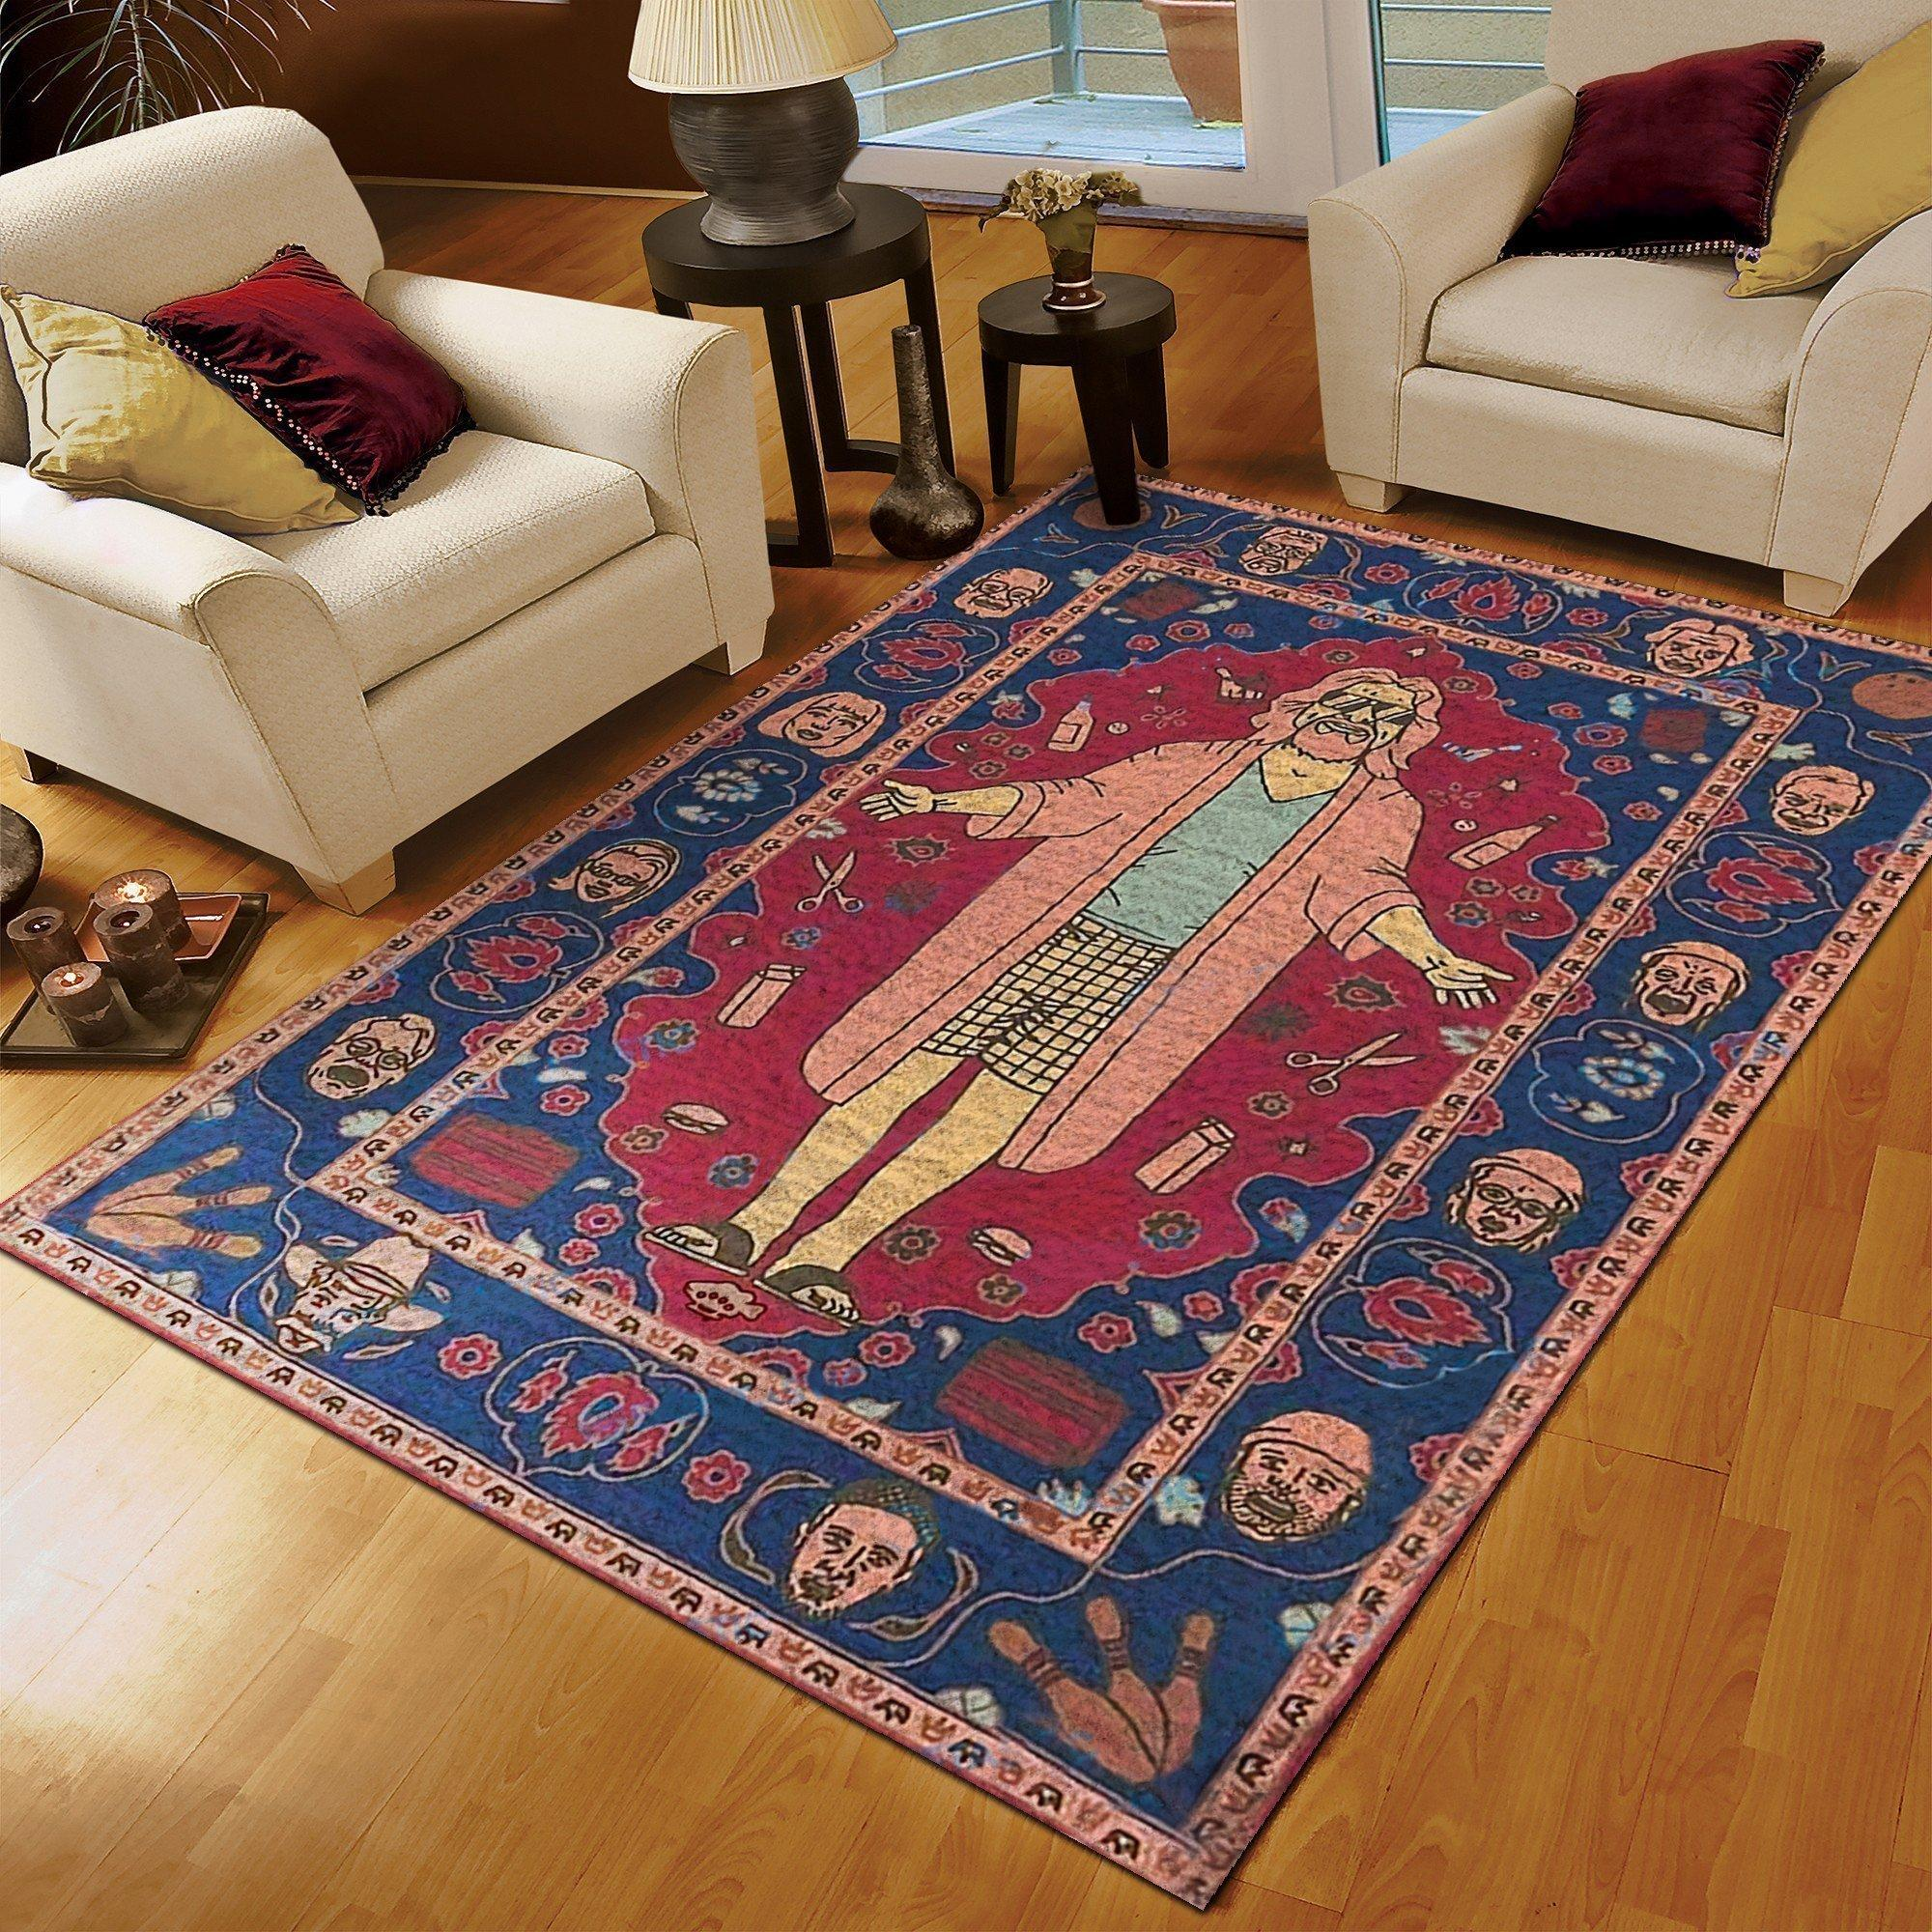 The big lebowski rug - maria